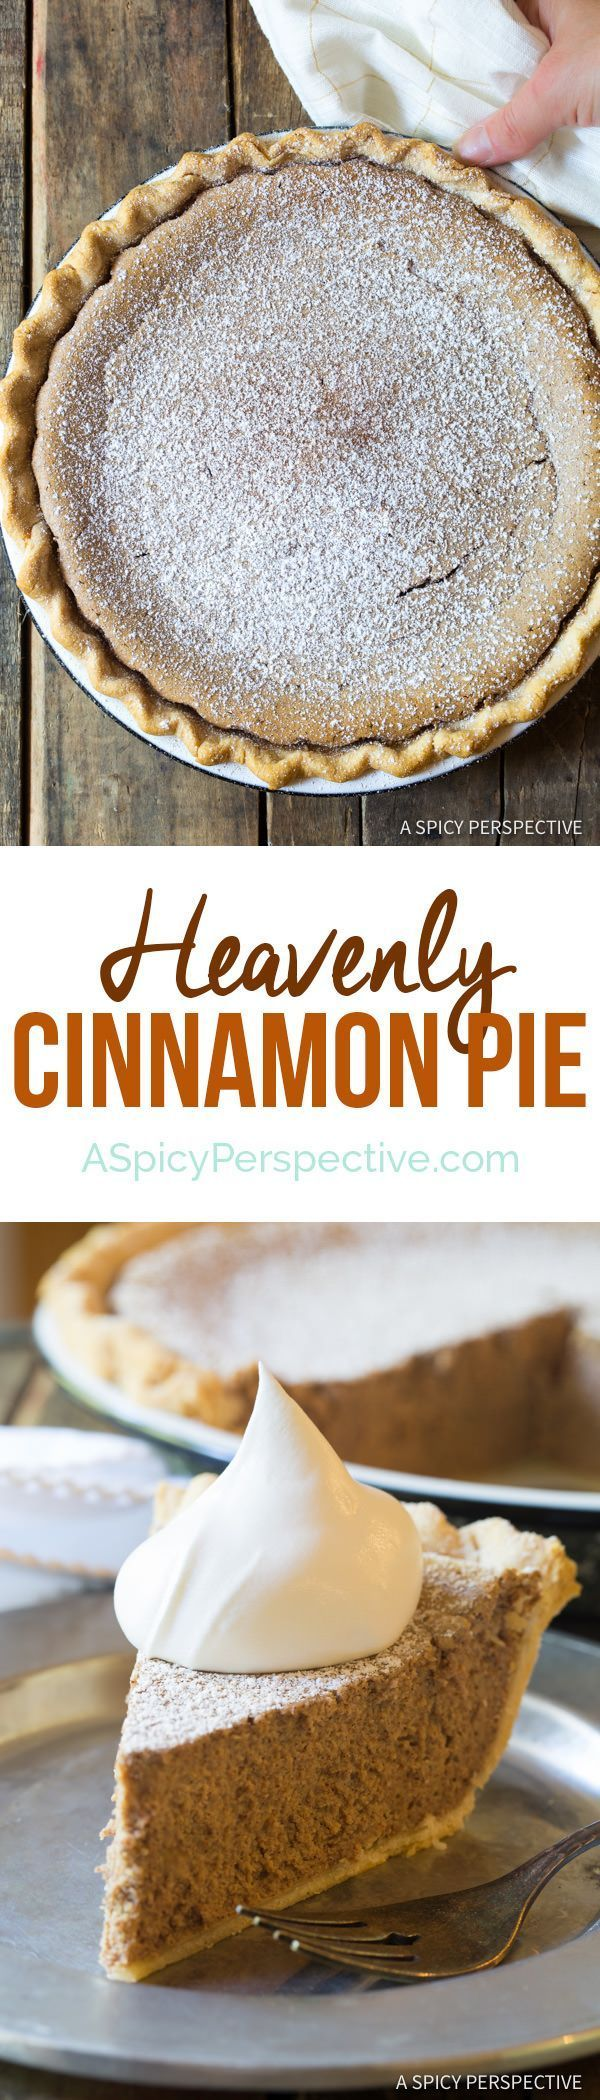 The Perfect Cinnamon Pie Recipe | http://ASpicyPerspective.com                                                                                                                                                                                 More